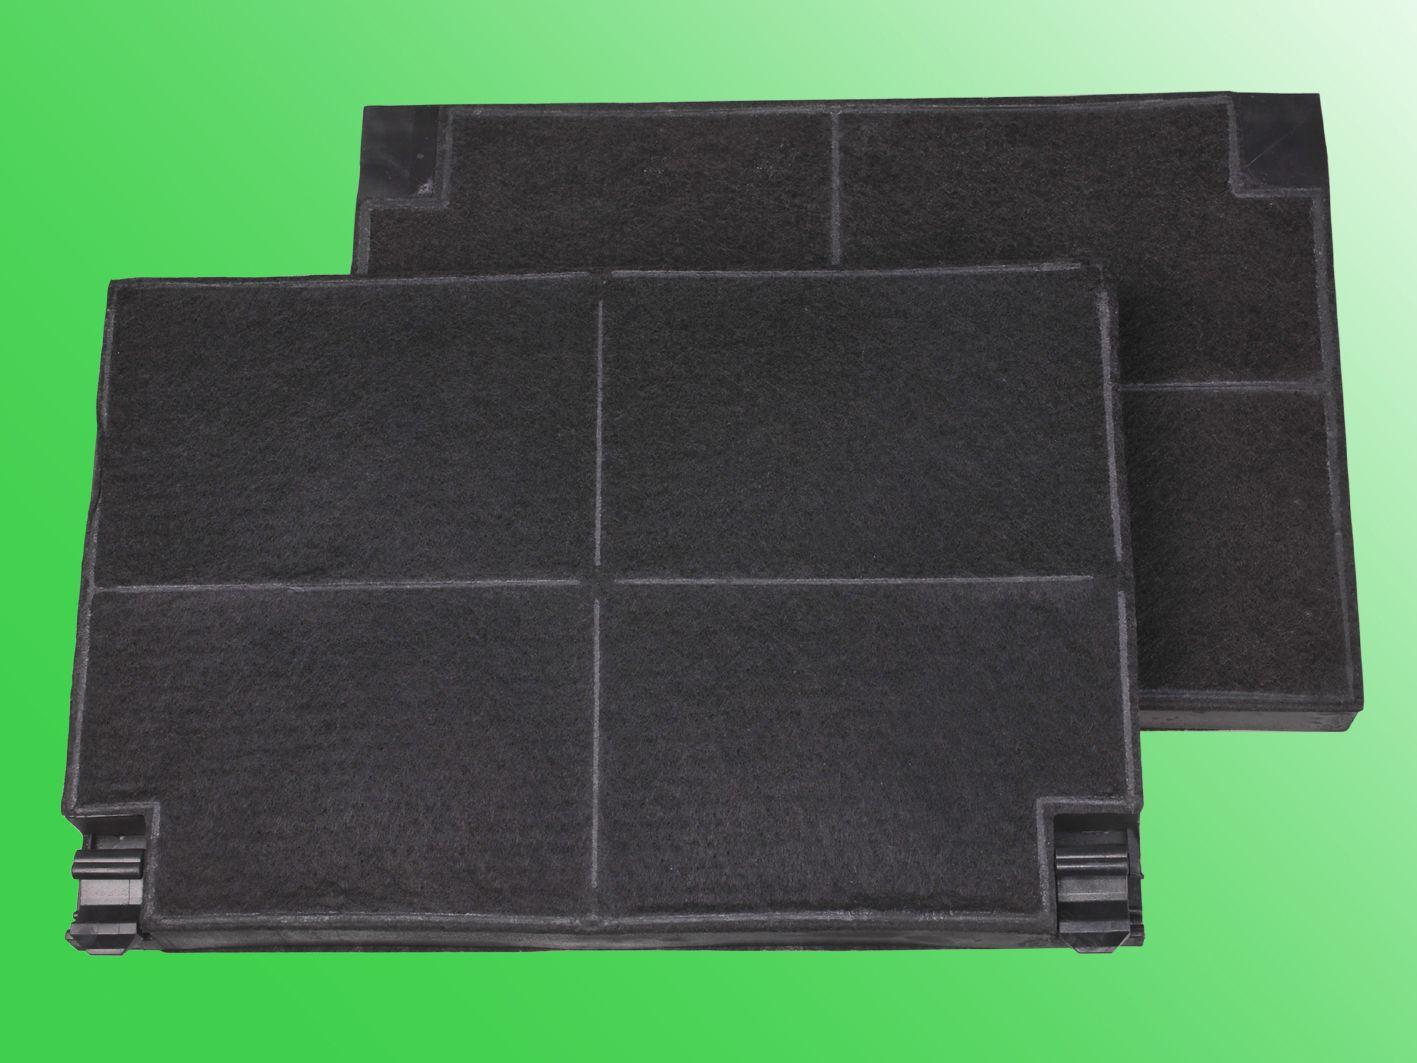 kohlefilter aktivkohlefilter dunstabzugshaube eff55 aeg. Black Bedroom Furniture Sets. Home Design Ideas